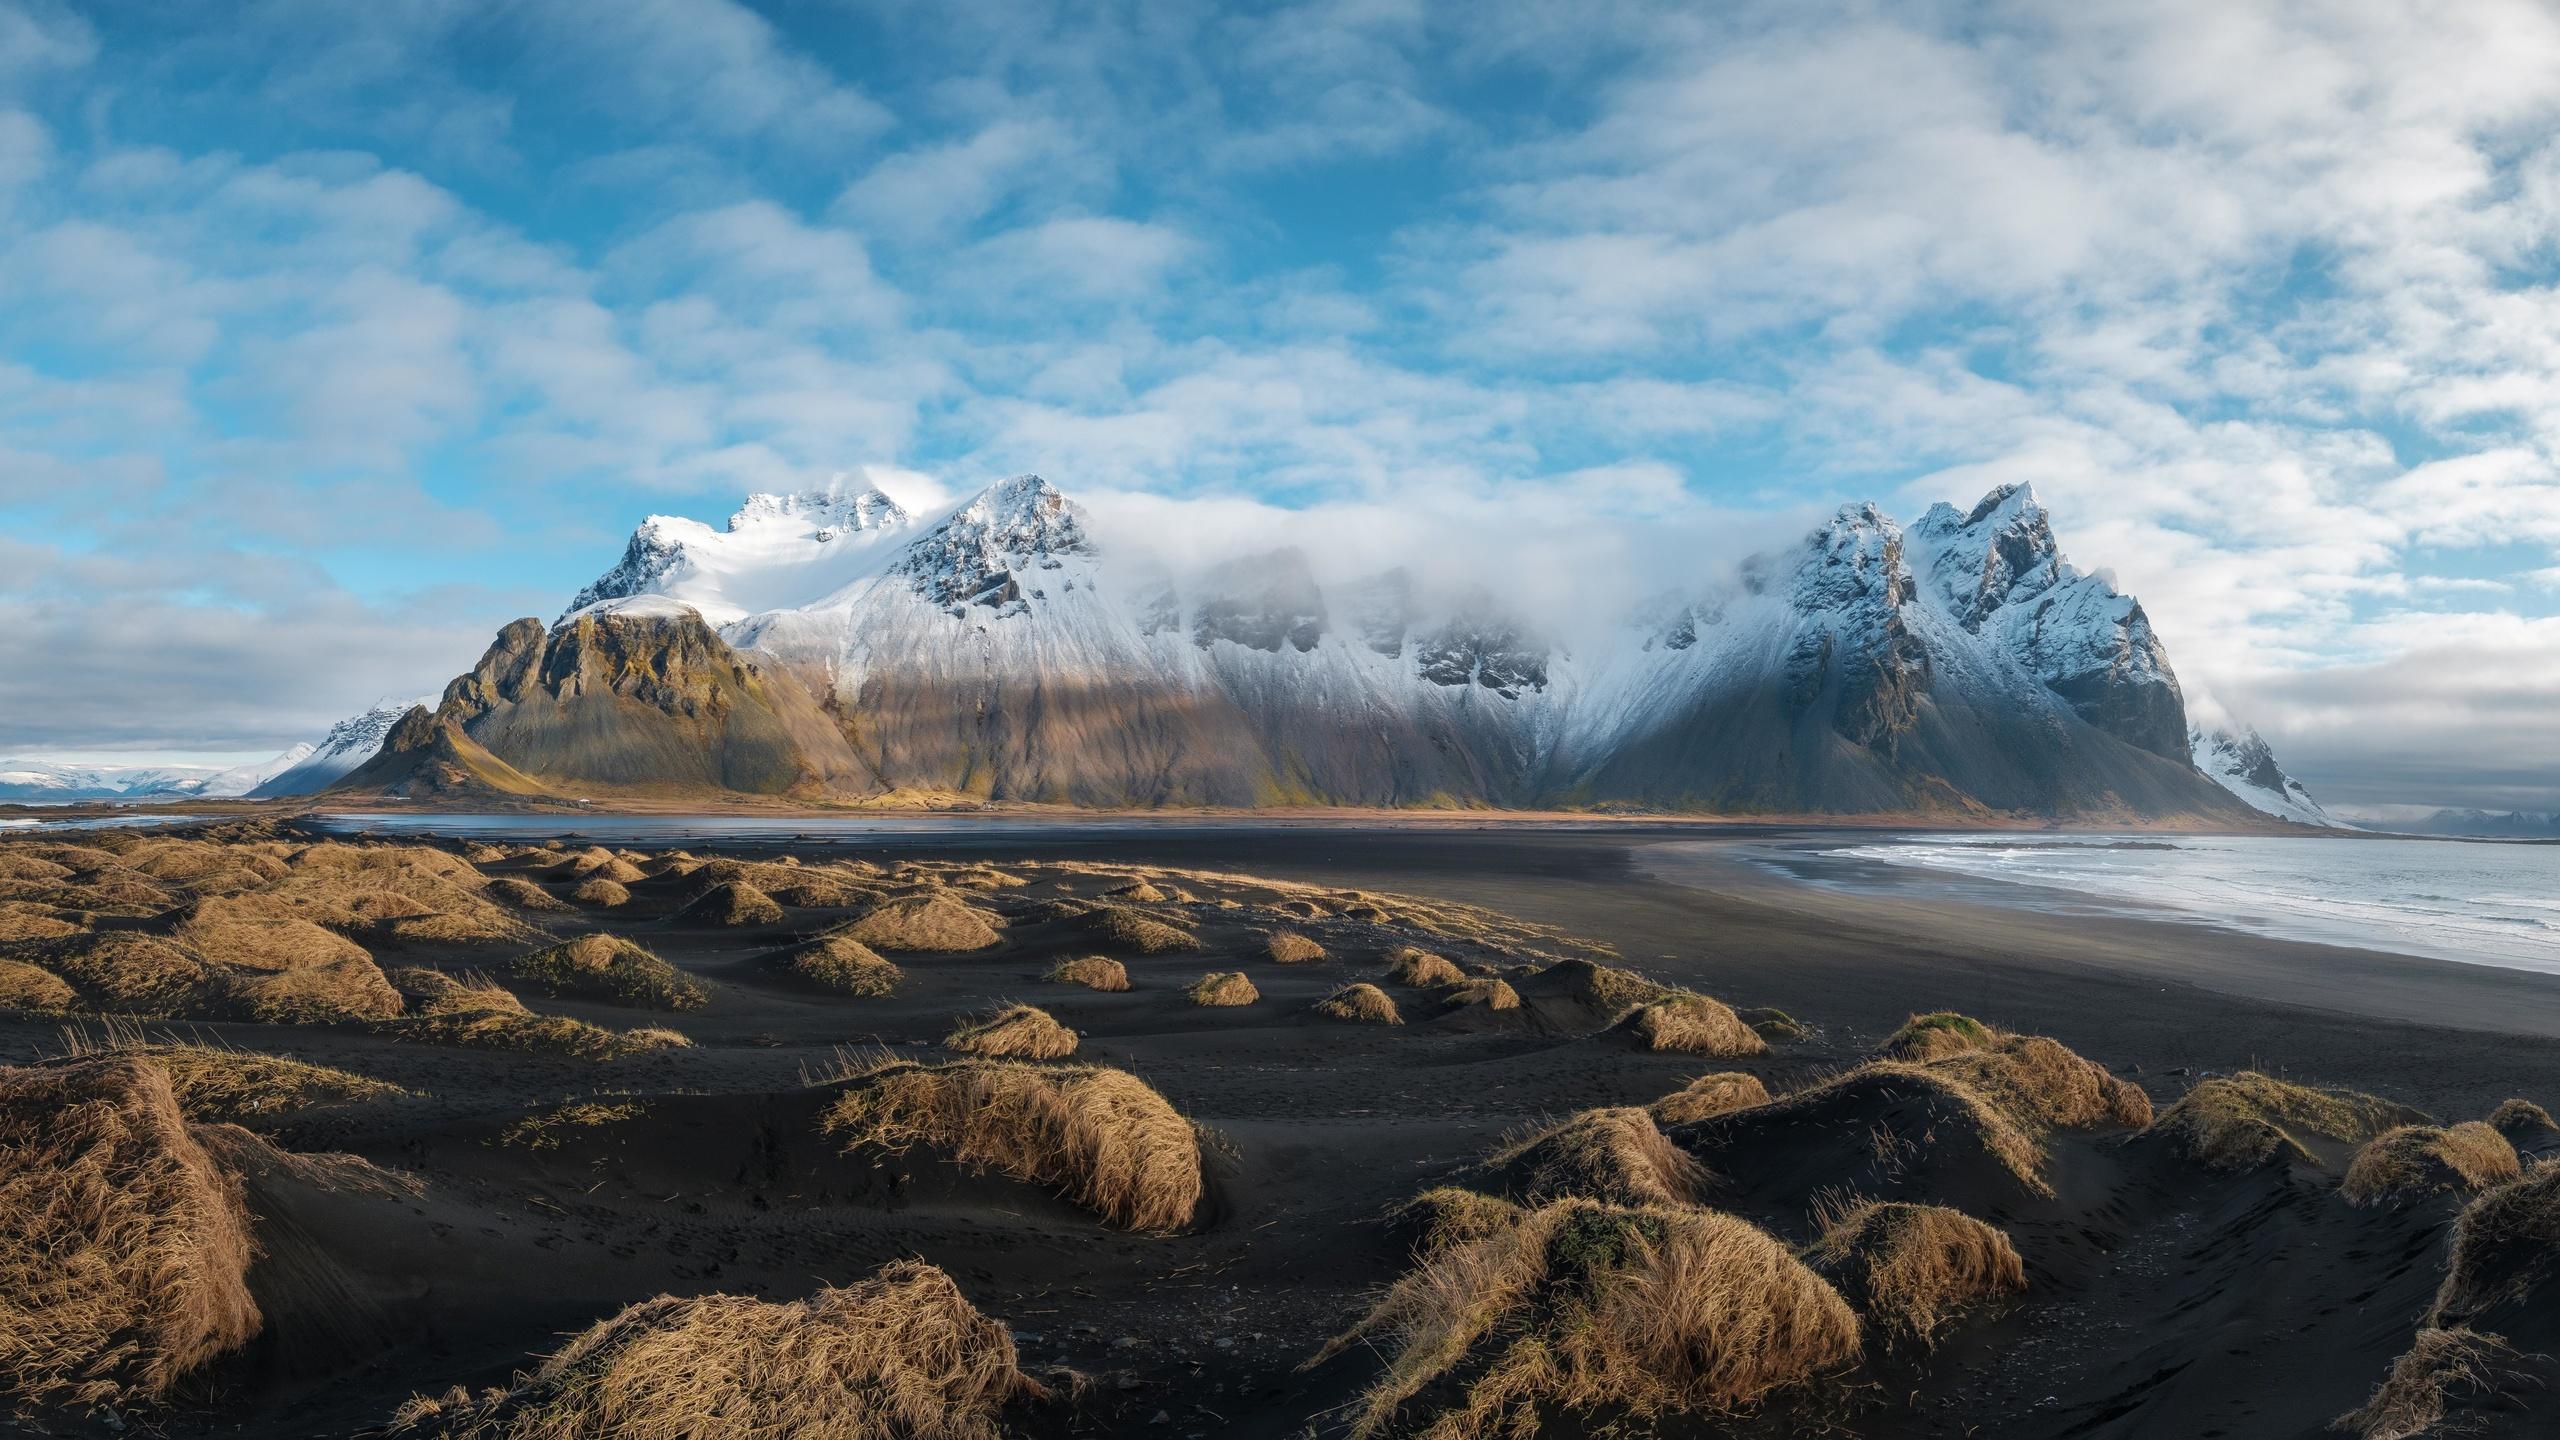 горы, рельеф, туман, пейзаж